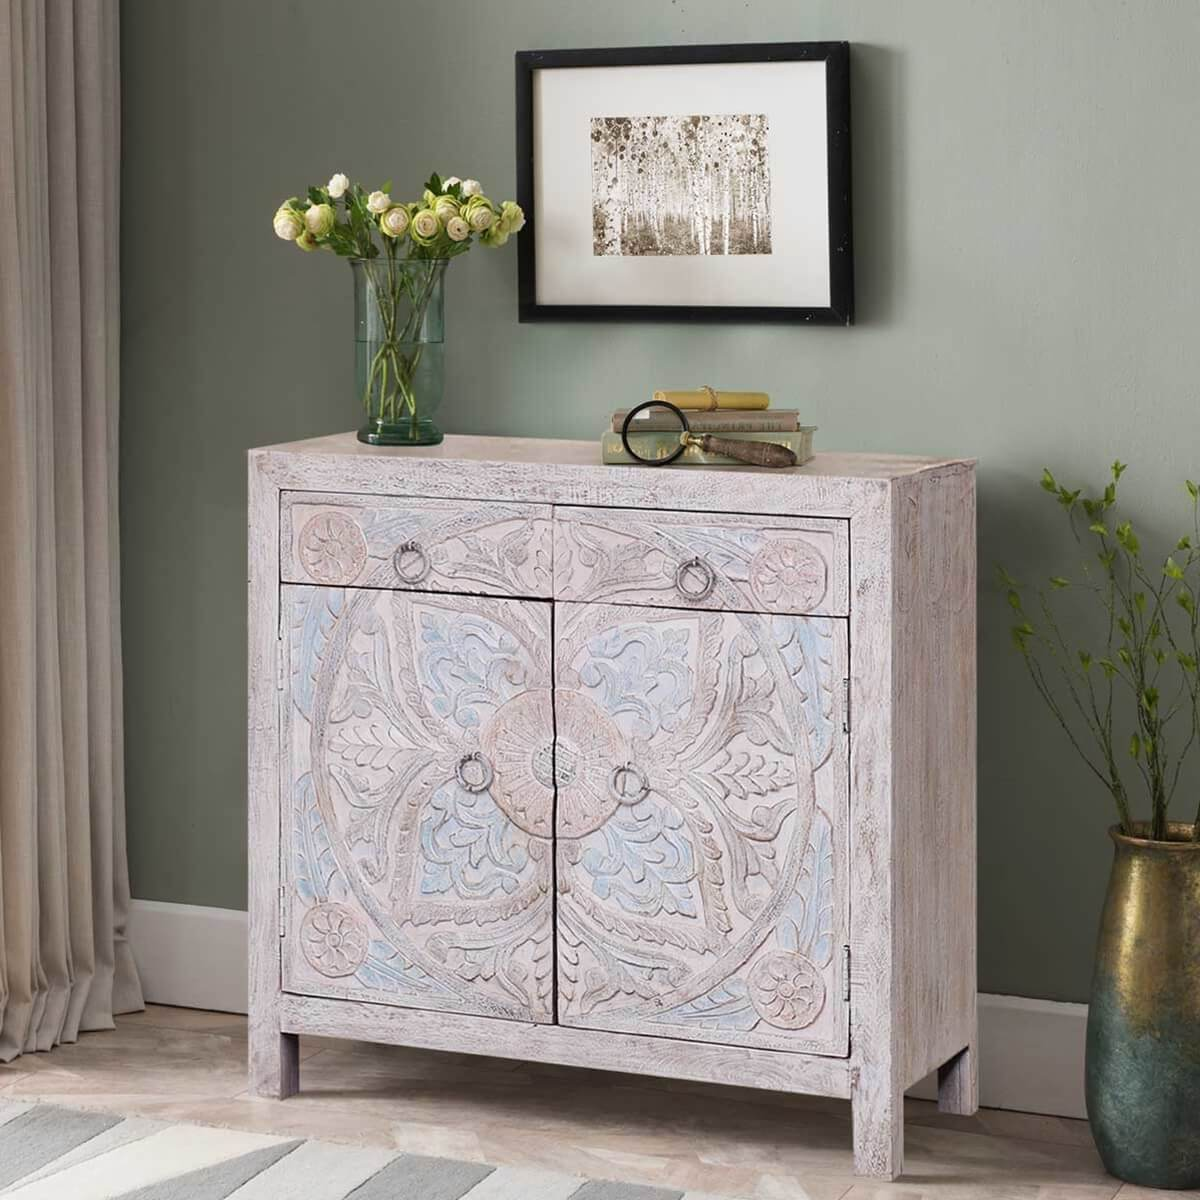 Trinway Mandala Carved Reclaimed Wood Buffet Cabinet w 2 Drawers